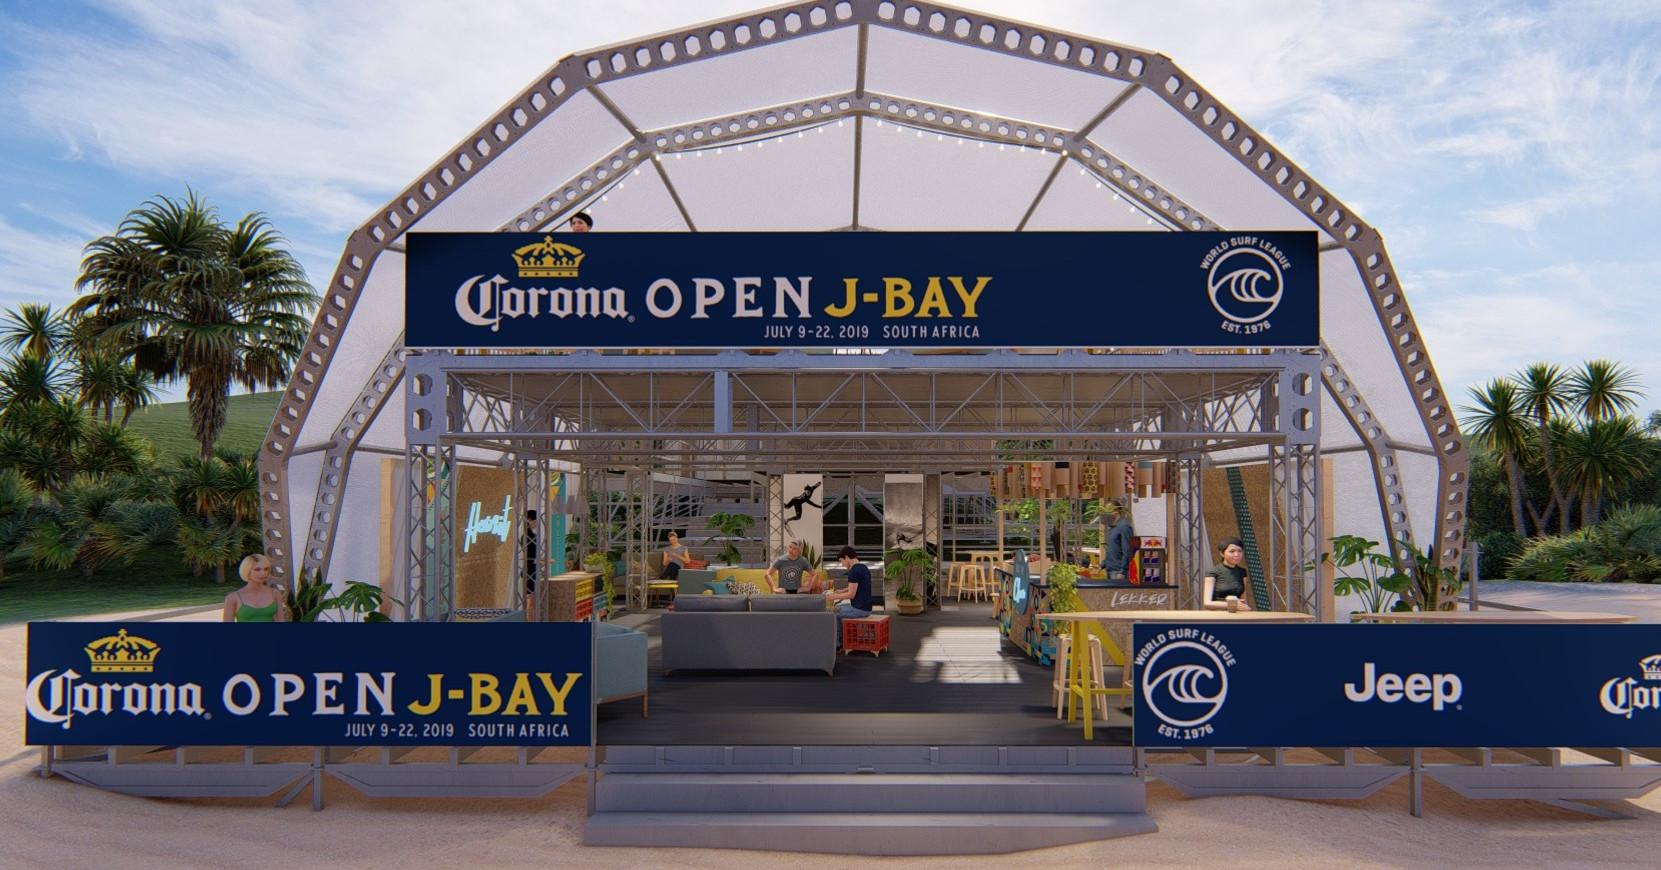 Corona J-Bay Open